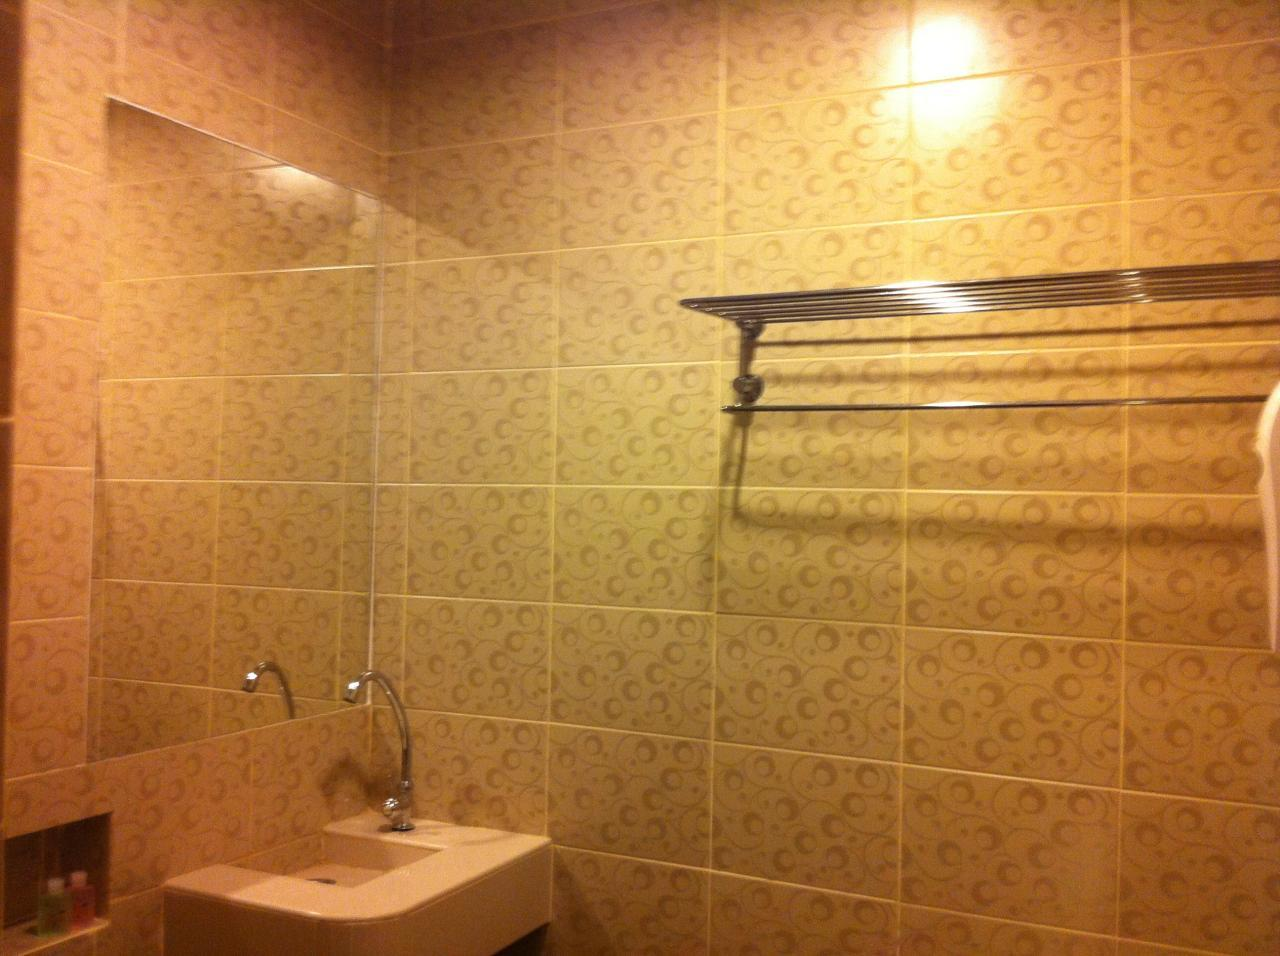 Best Price On Yomi Hotel In Kota Kinabalu + Reviews